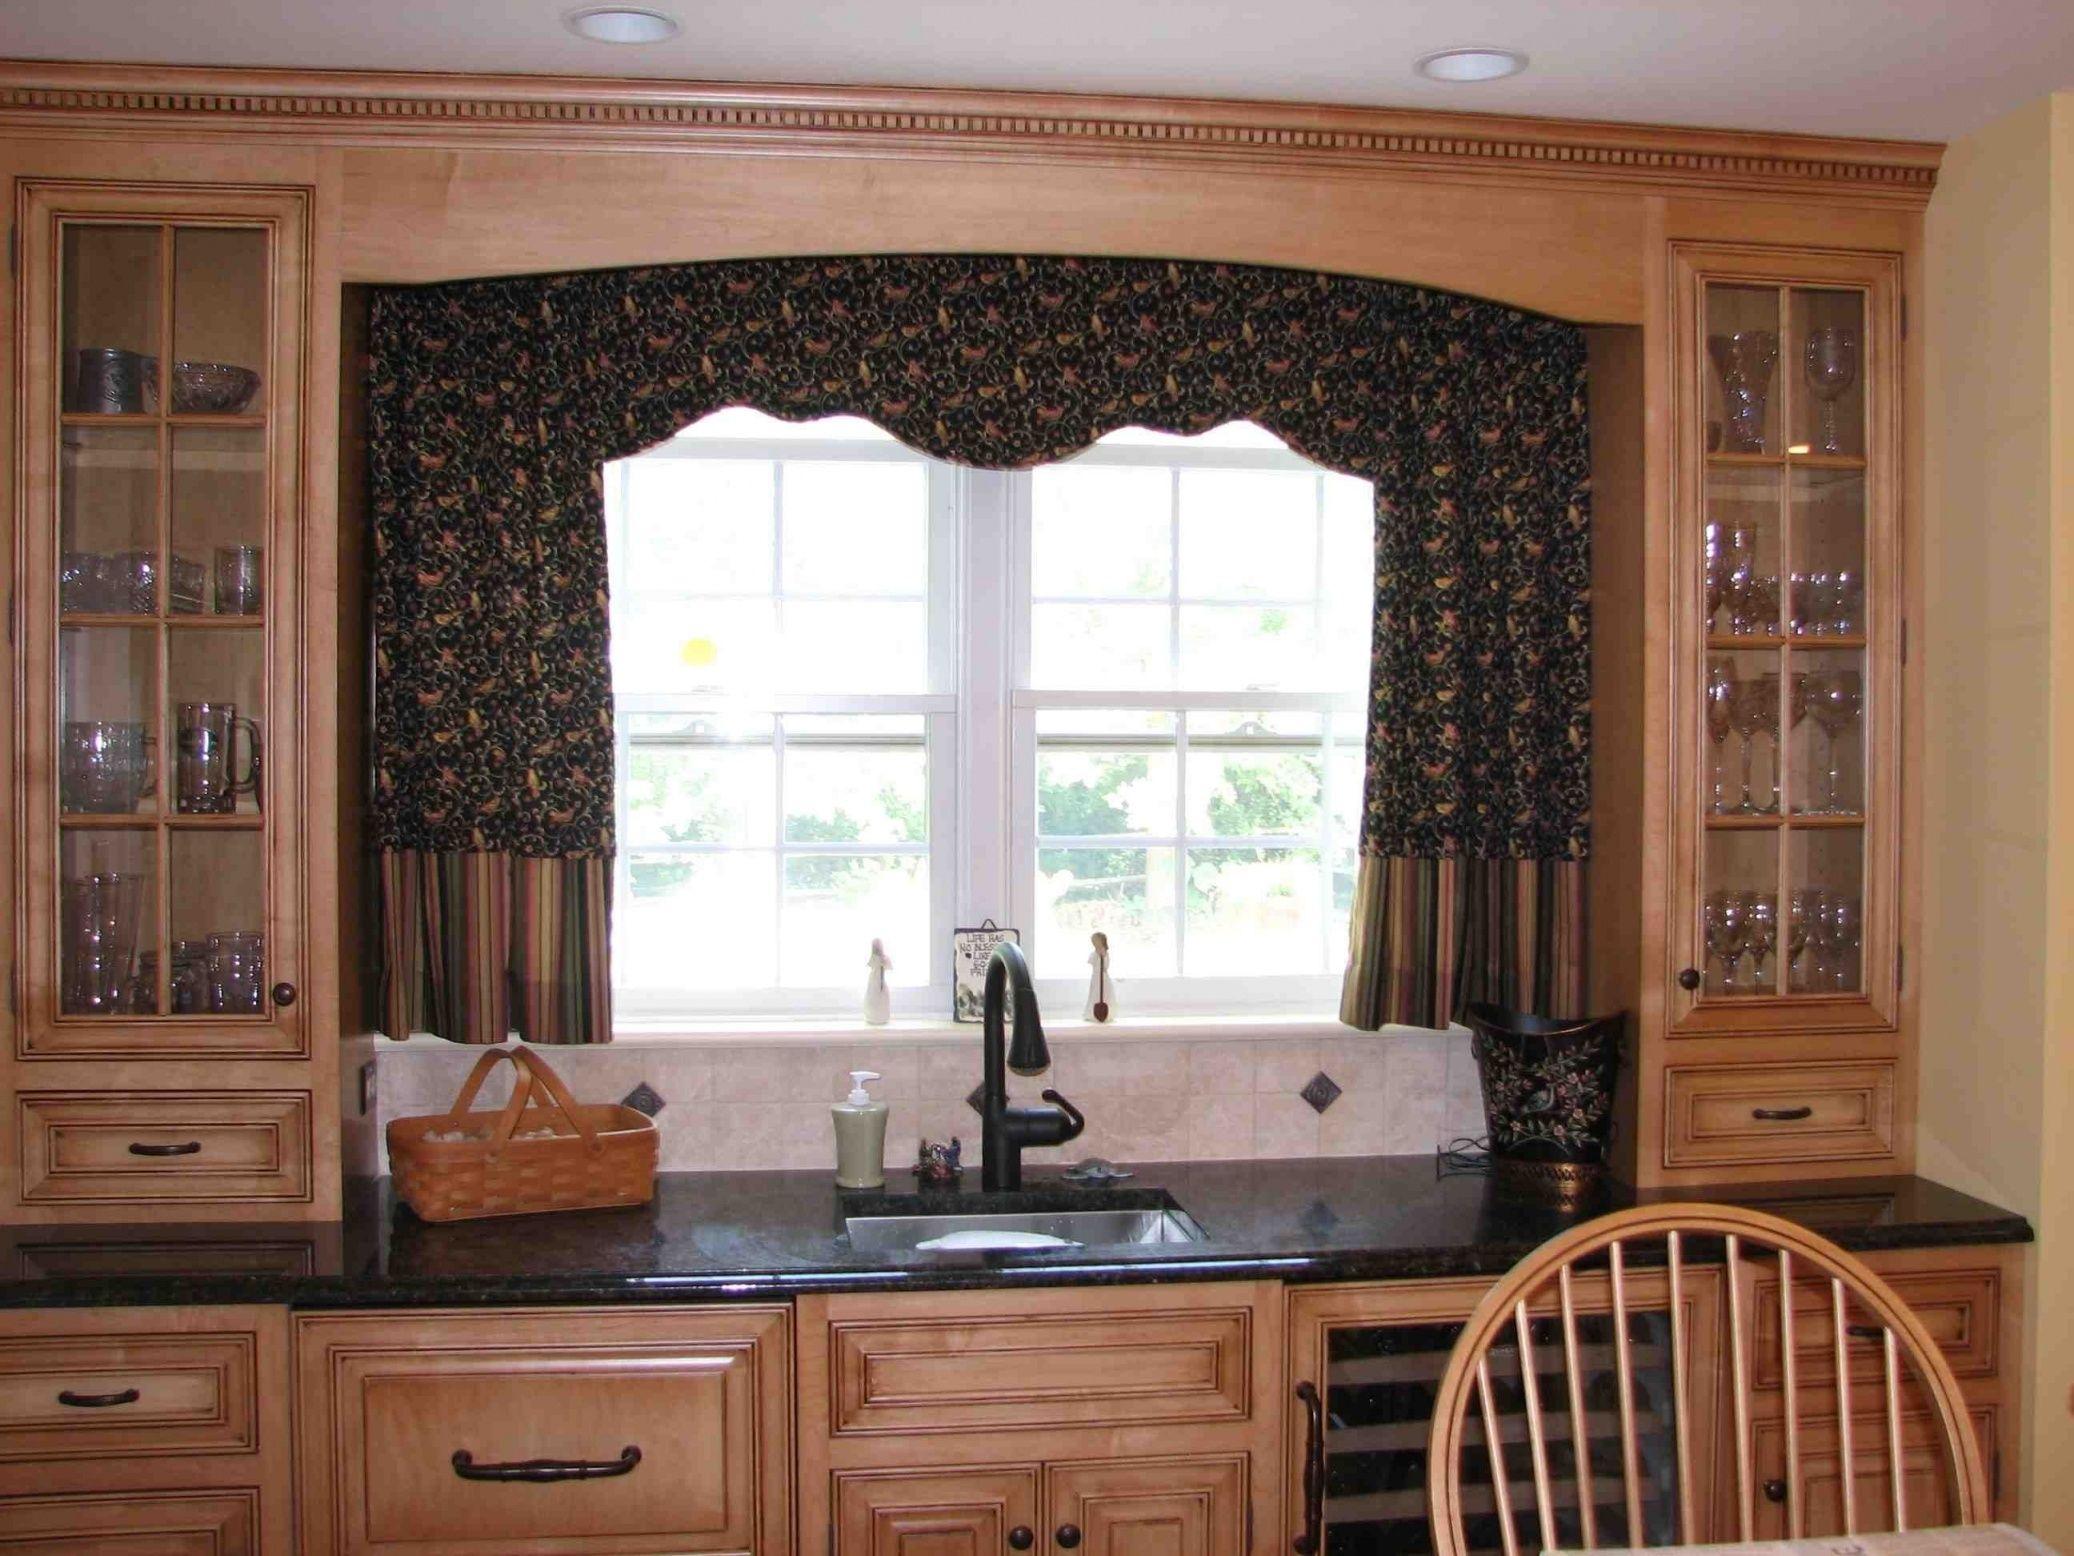 Elegant Unique Kitchen Drapery Ideas Kitchen window